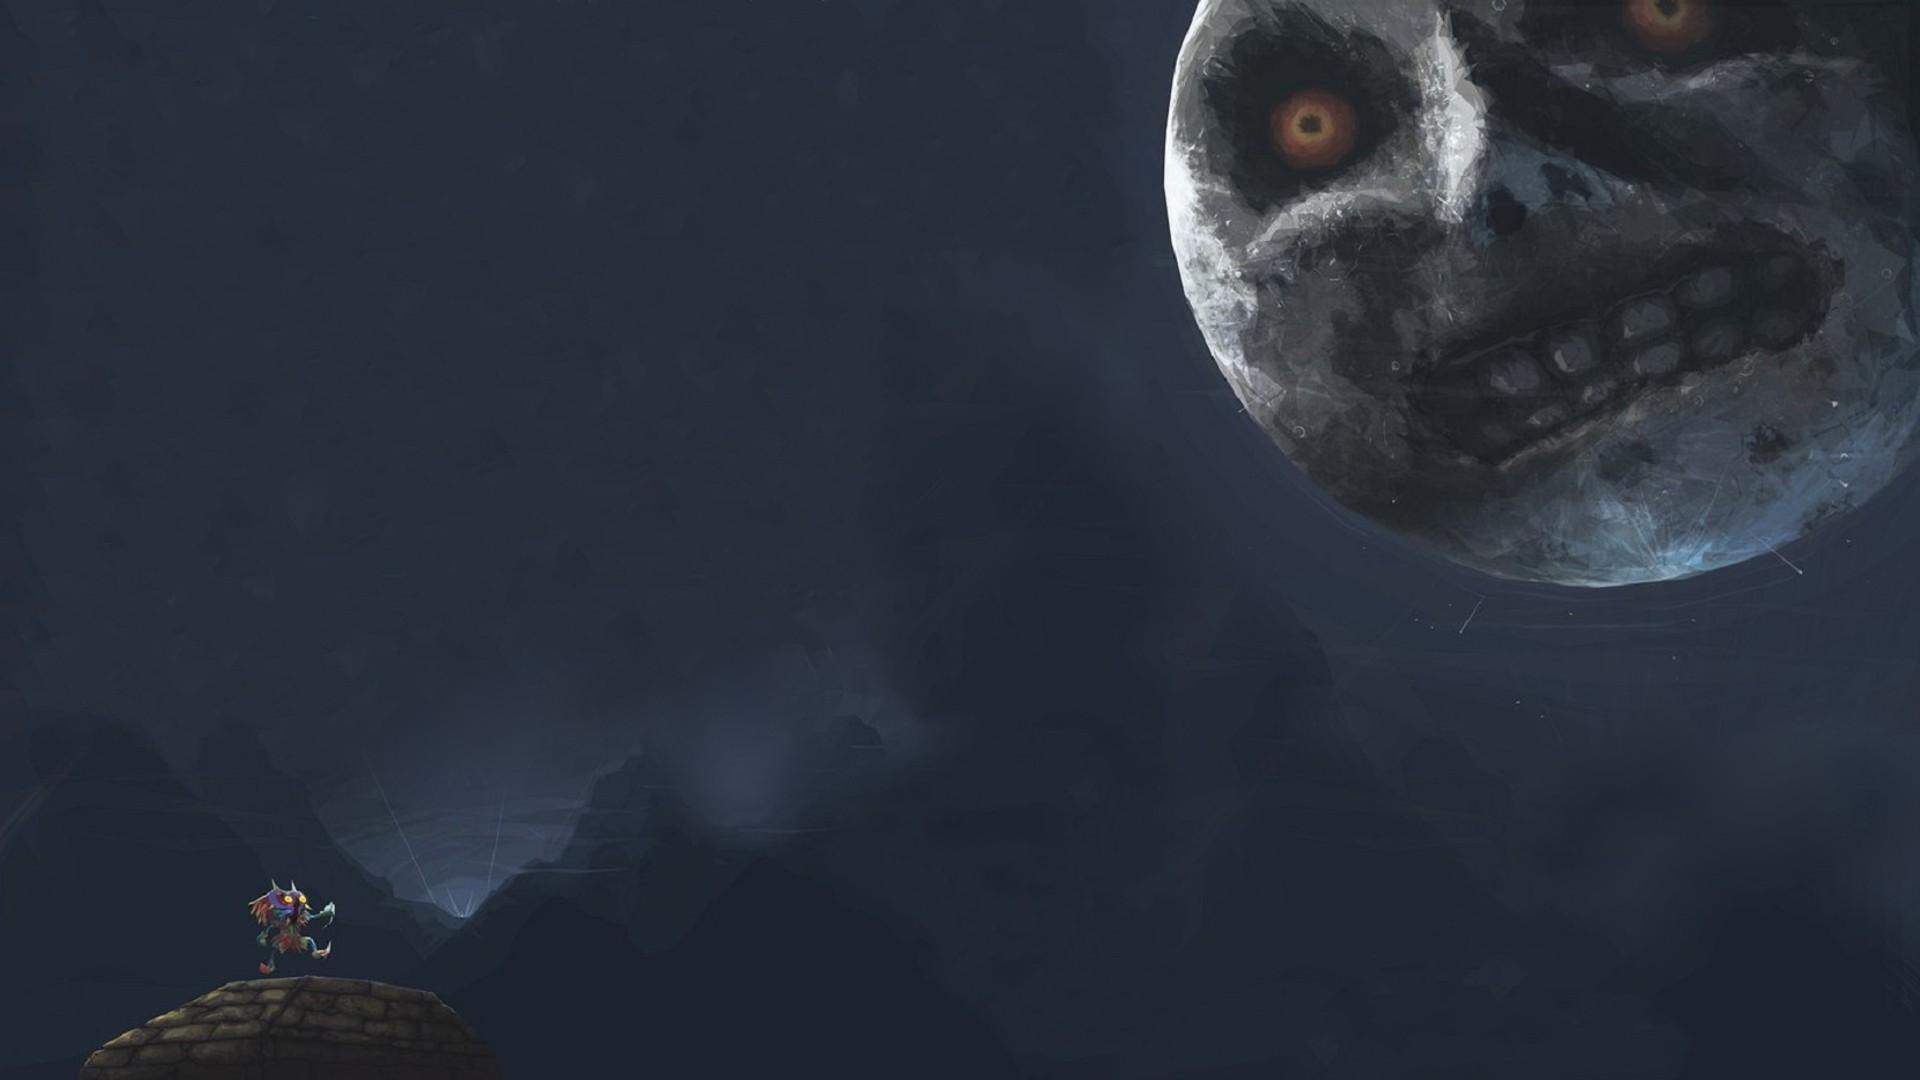 the legend of zelda video games skull kid the legend of zelda: majora's mask